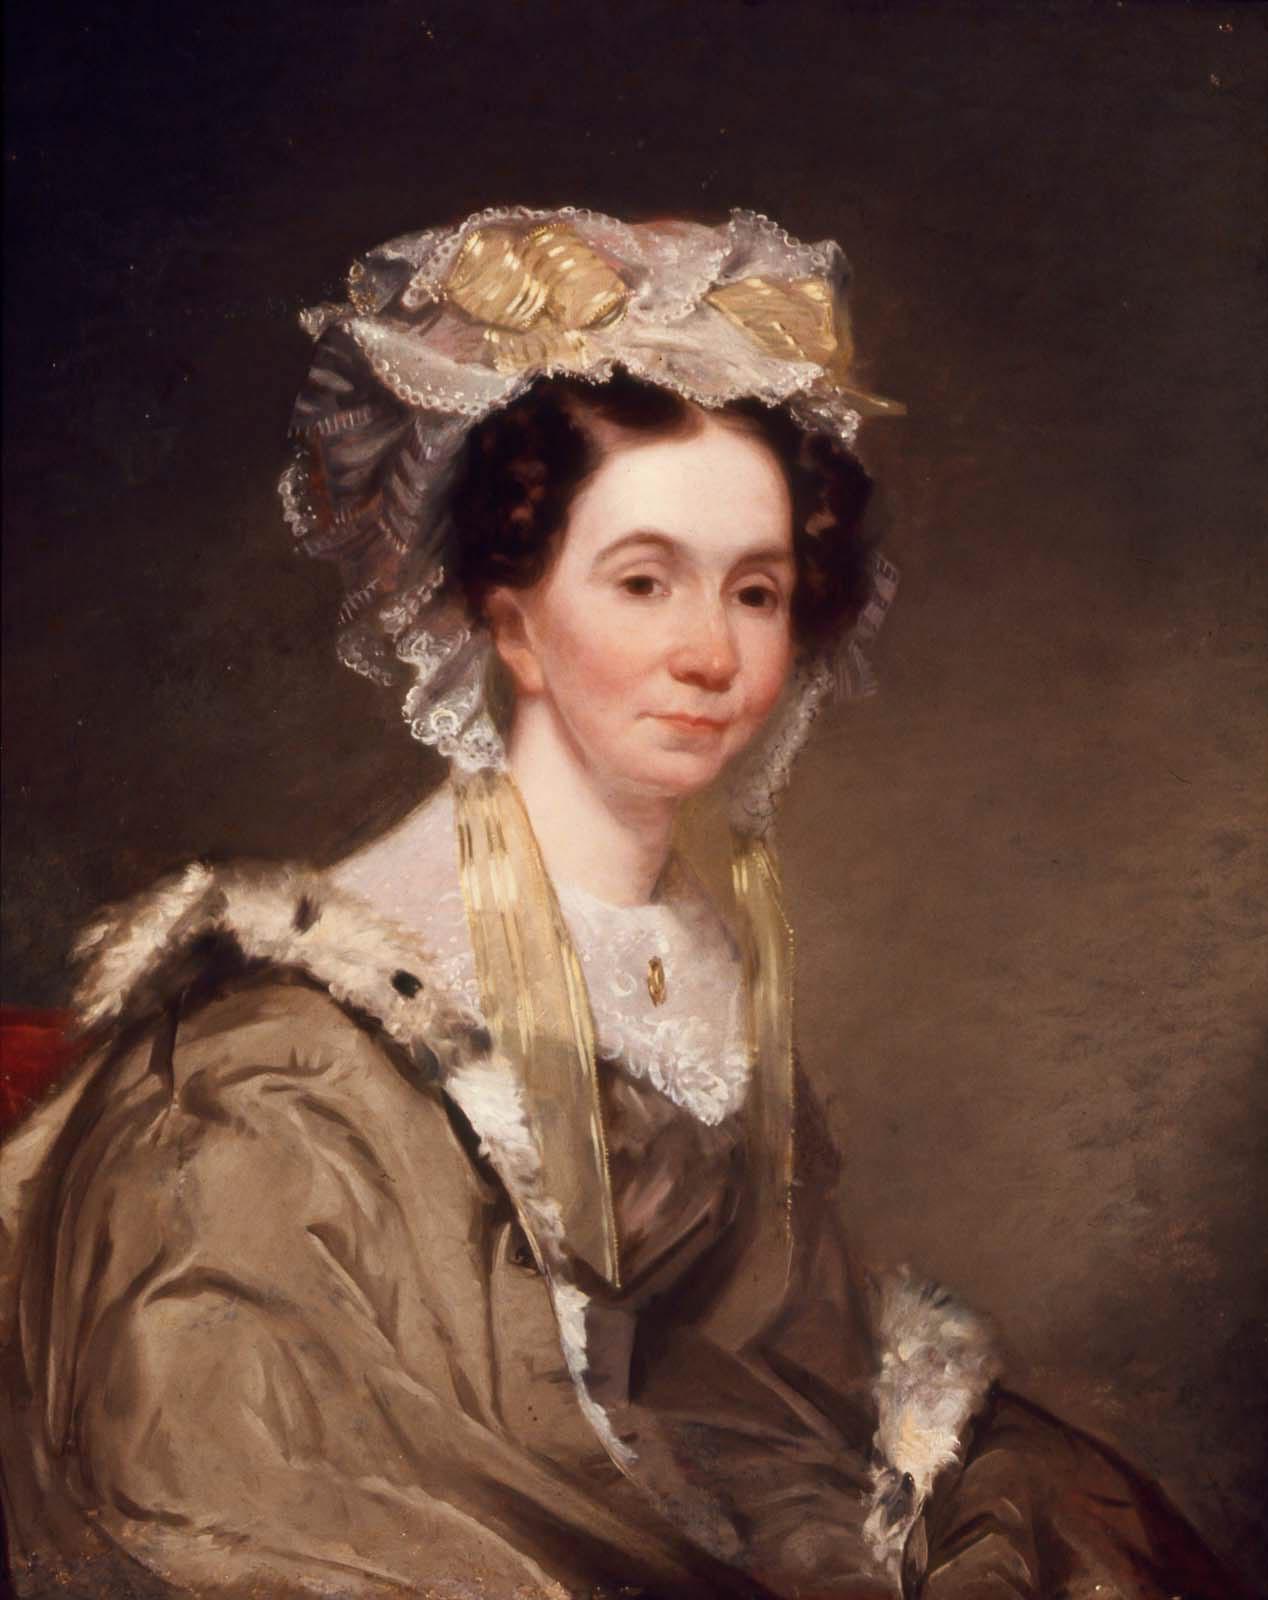 Boston 1775: Mansplaining about Dr. Joseph Warren